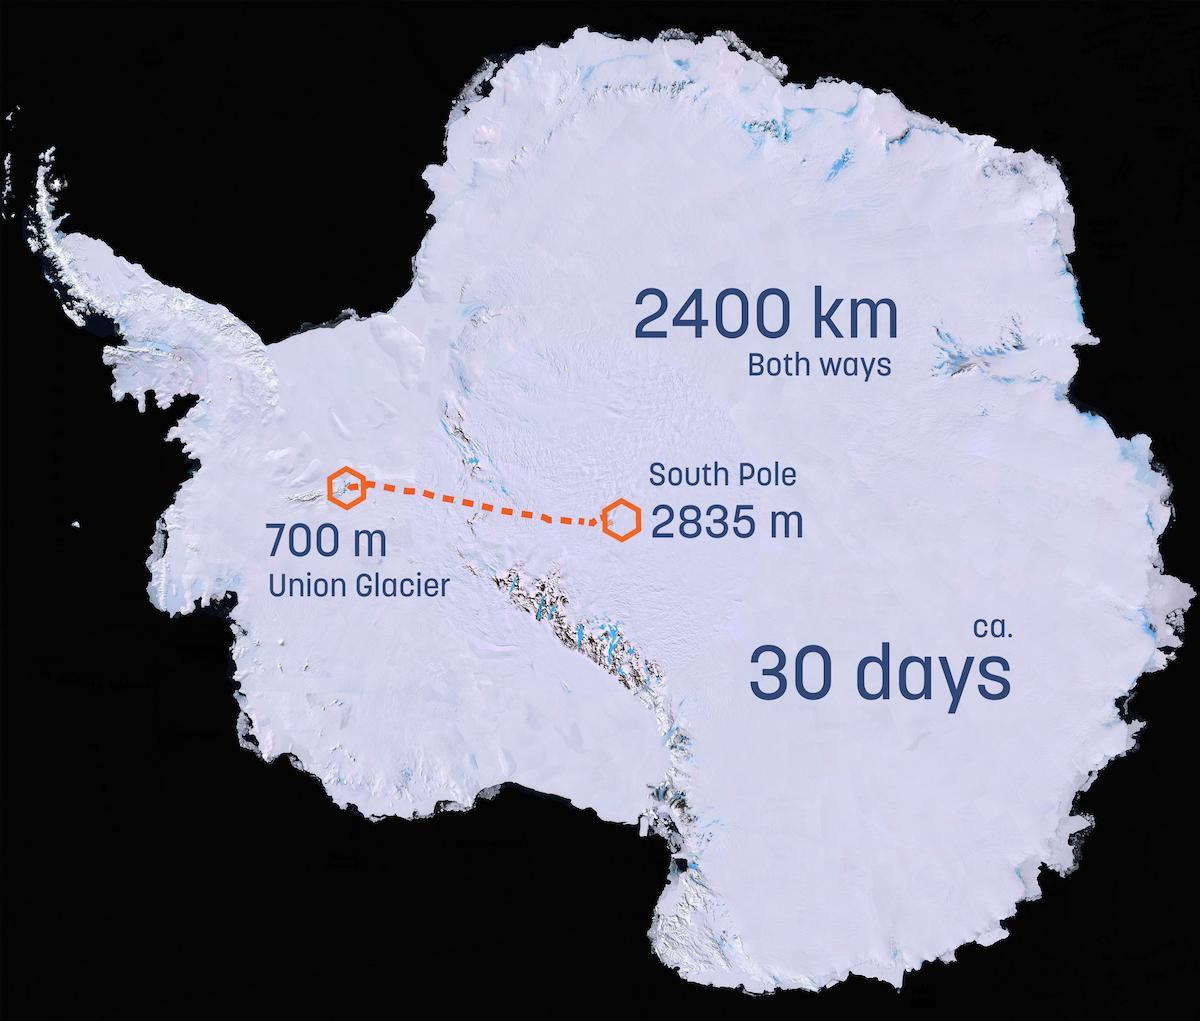 Antarcticaroute-1539714525845-1539714527736.jpg